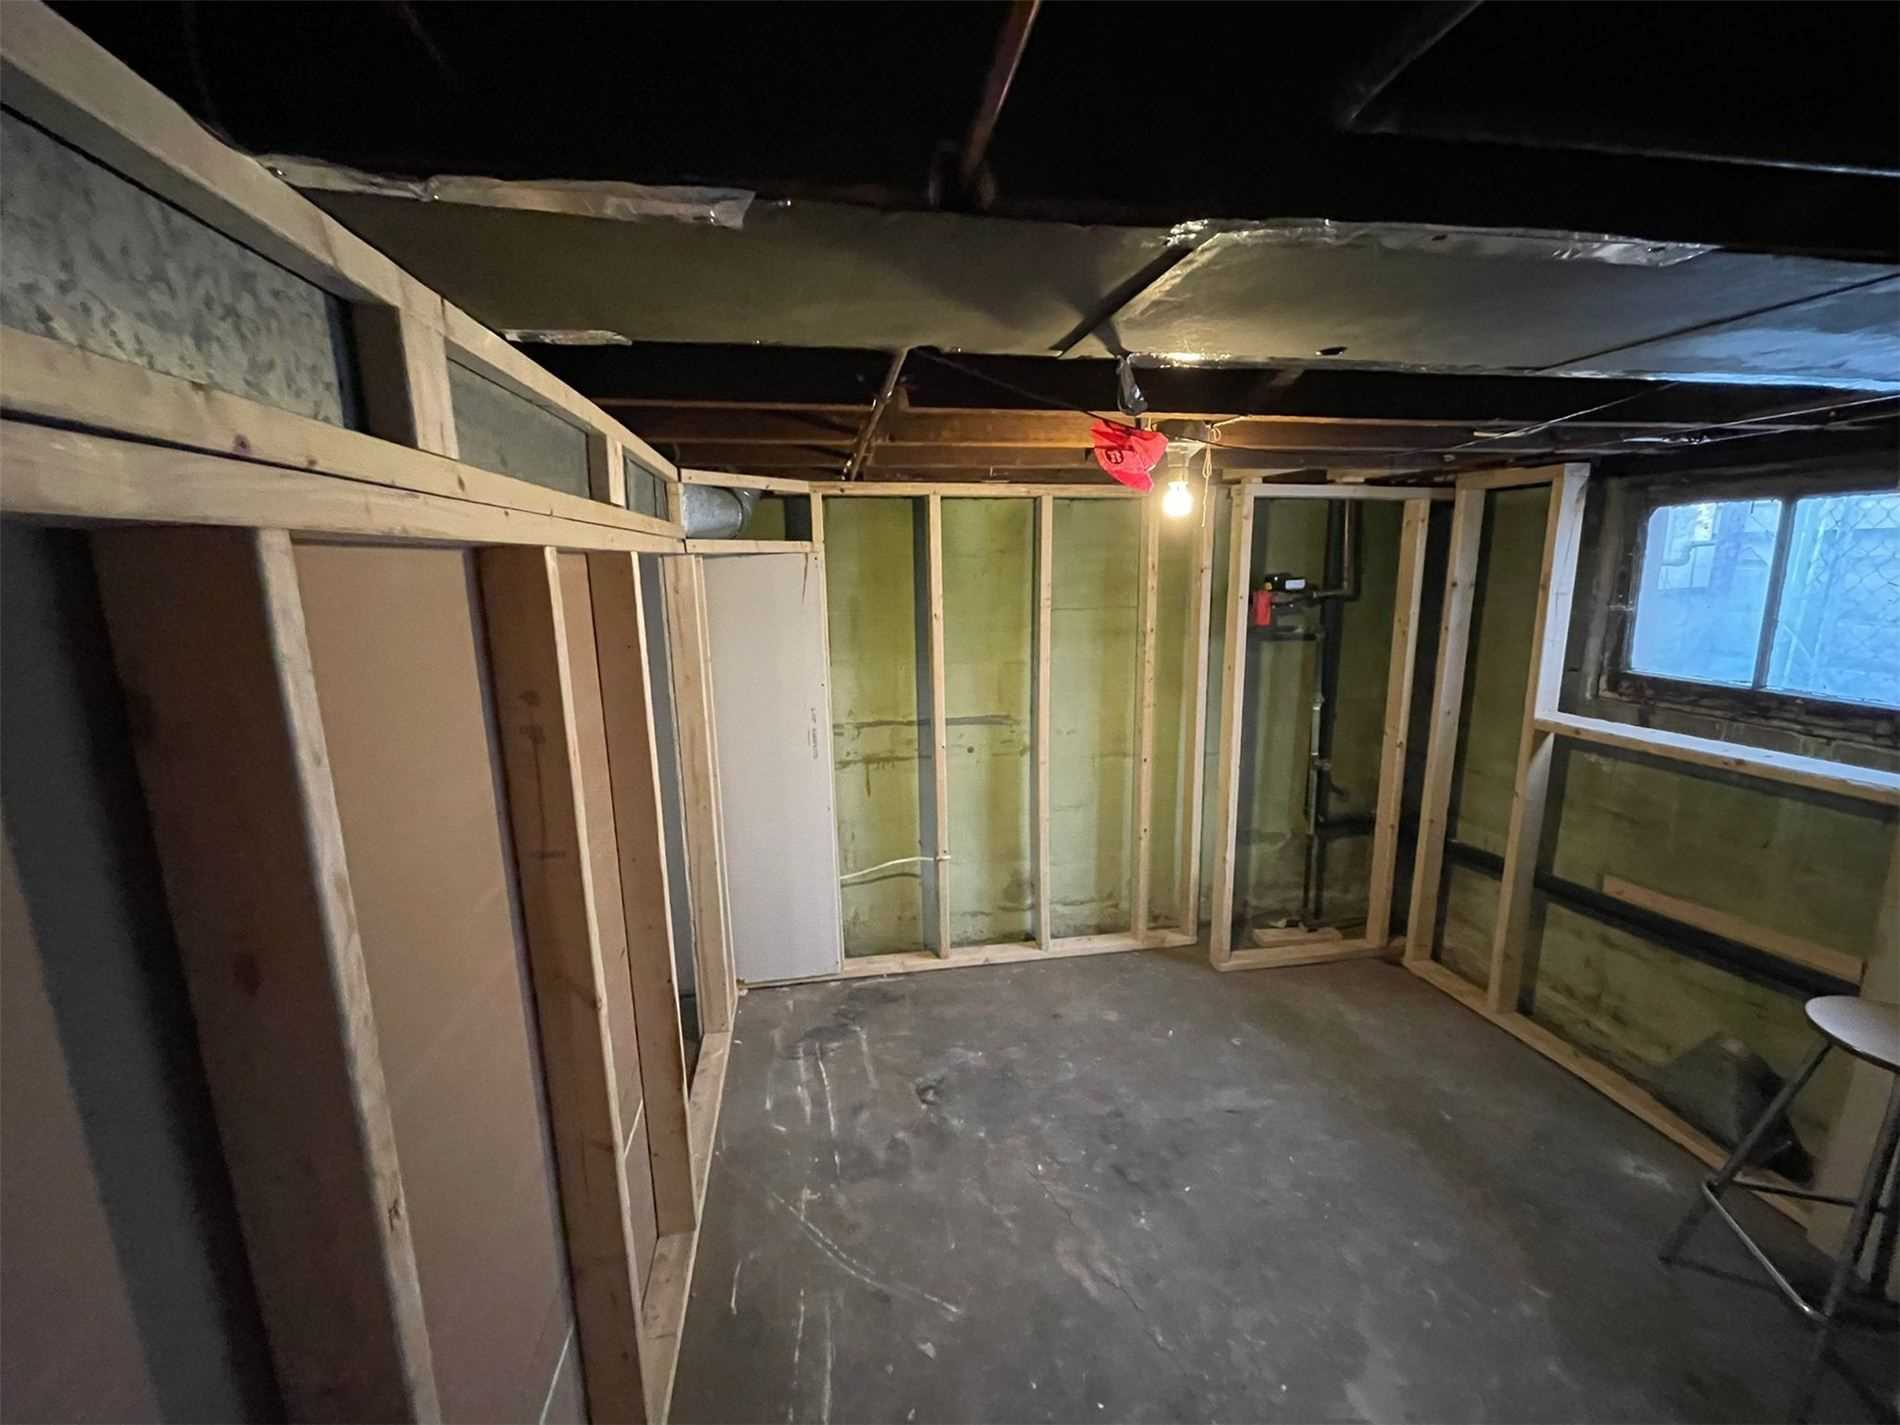 Detached house For Sale In Windsor - 967 Windsor Ave, Windsor, Ontario, Canada N9A 1K1 , 4 Bedrooms Bedrooms, ,2 BathroomsBathrooms,Detached,For Sale,Windsor